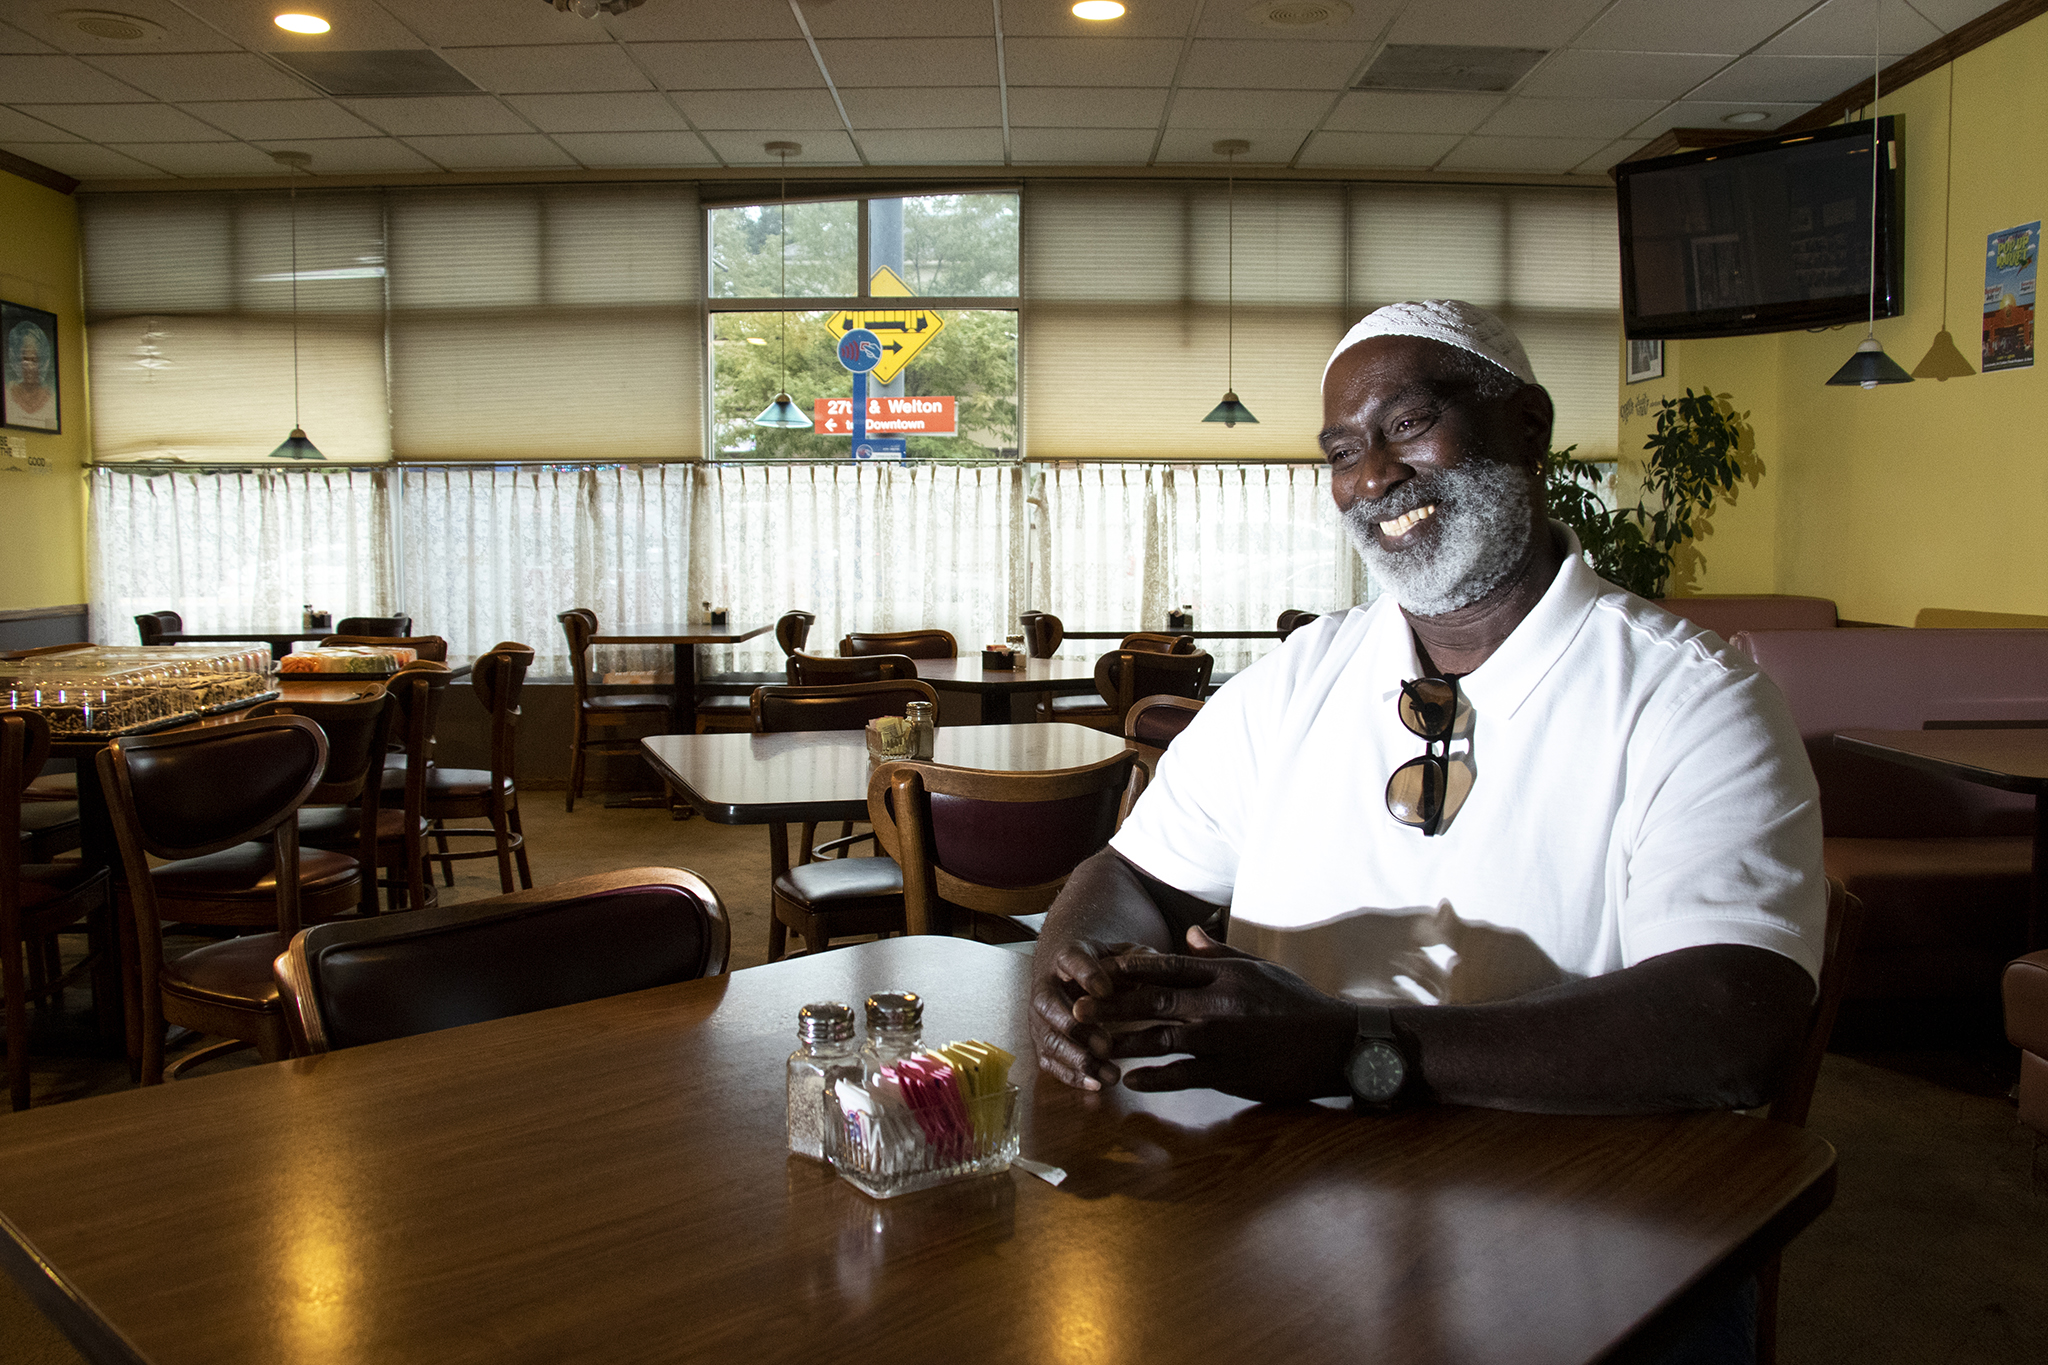 Welton Street Cafe celebrates a milestone; Five Points celebrates culture and community